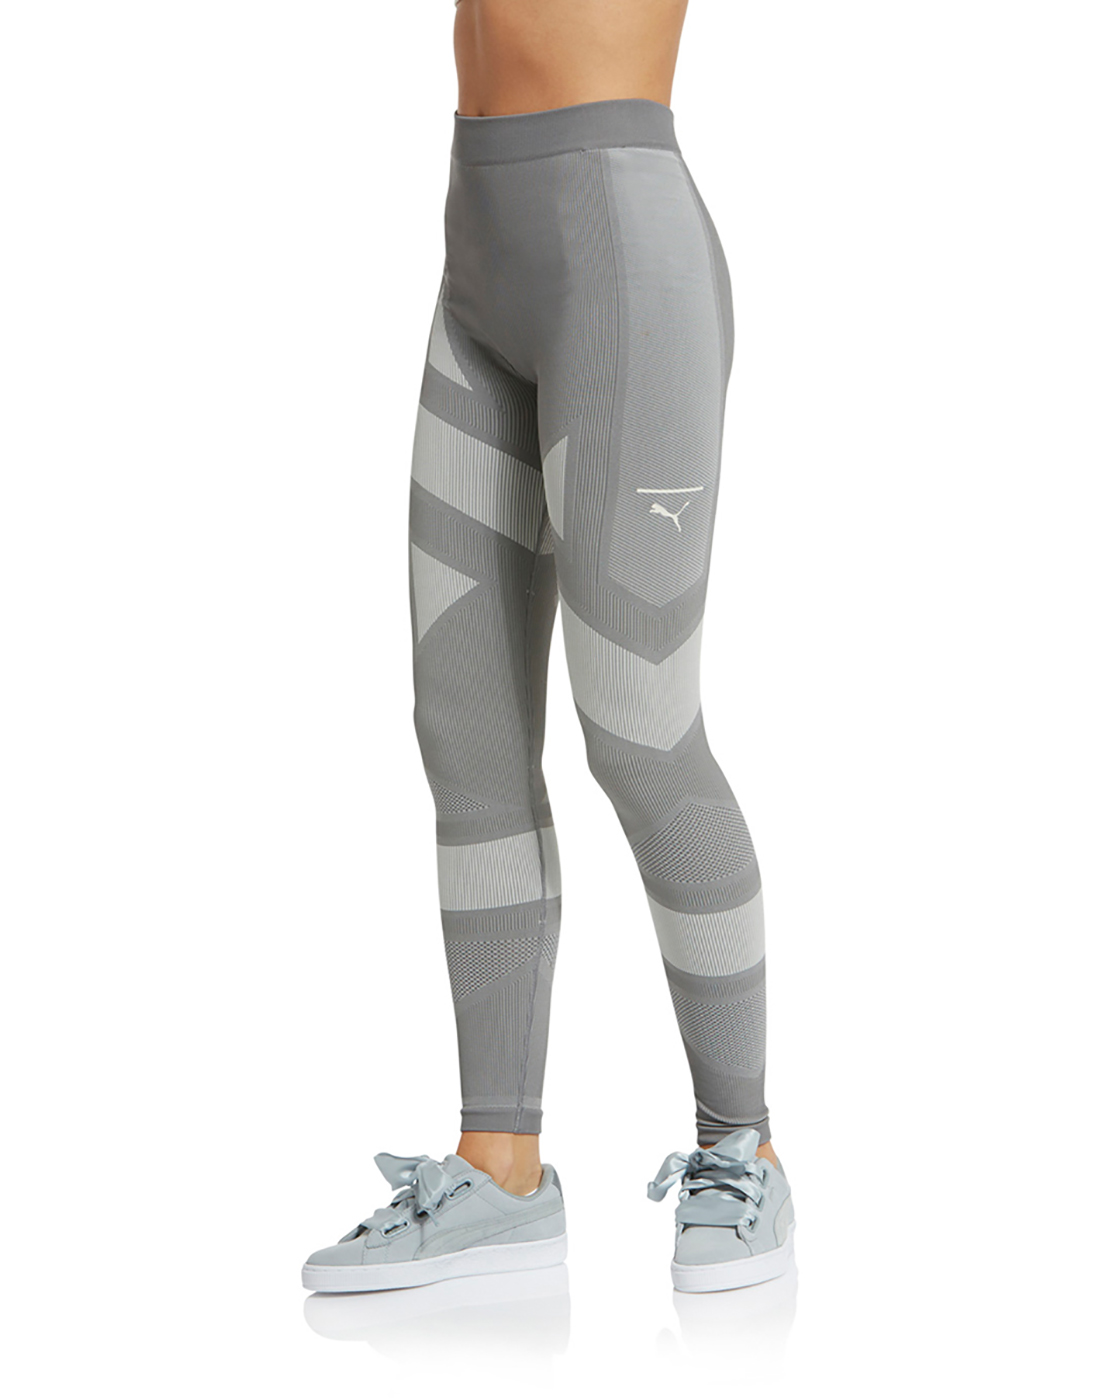 b2e5930b11026b Puma Womens Evo Knit Legging | Life Style Sports